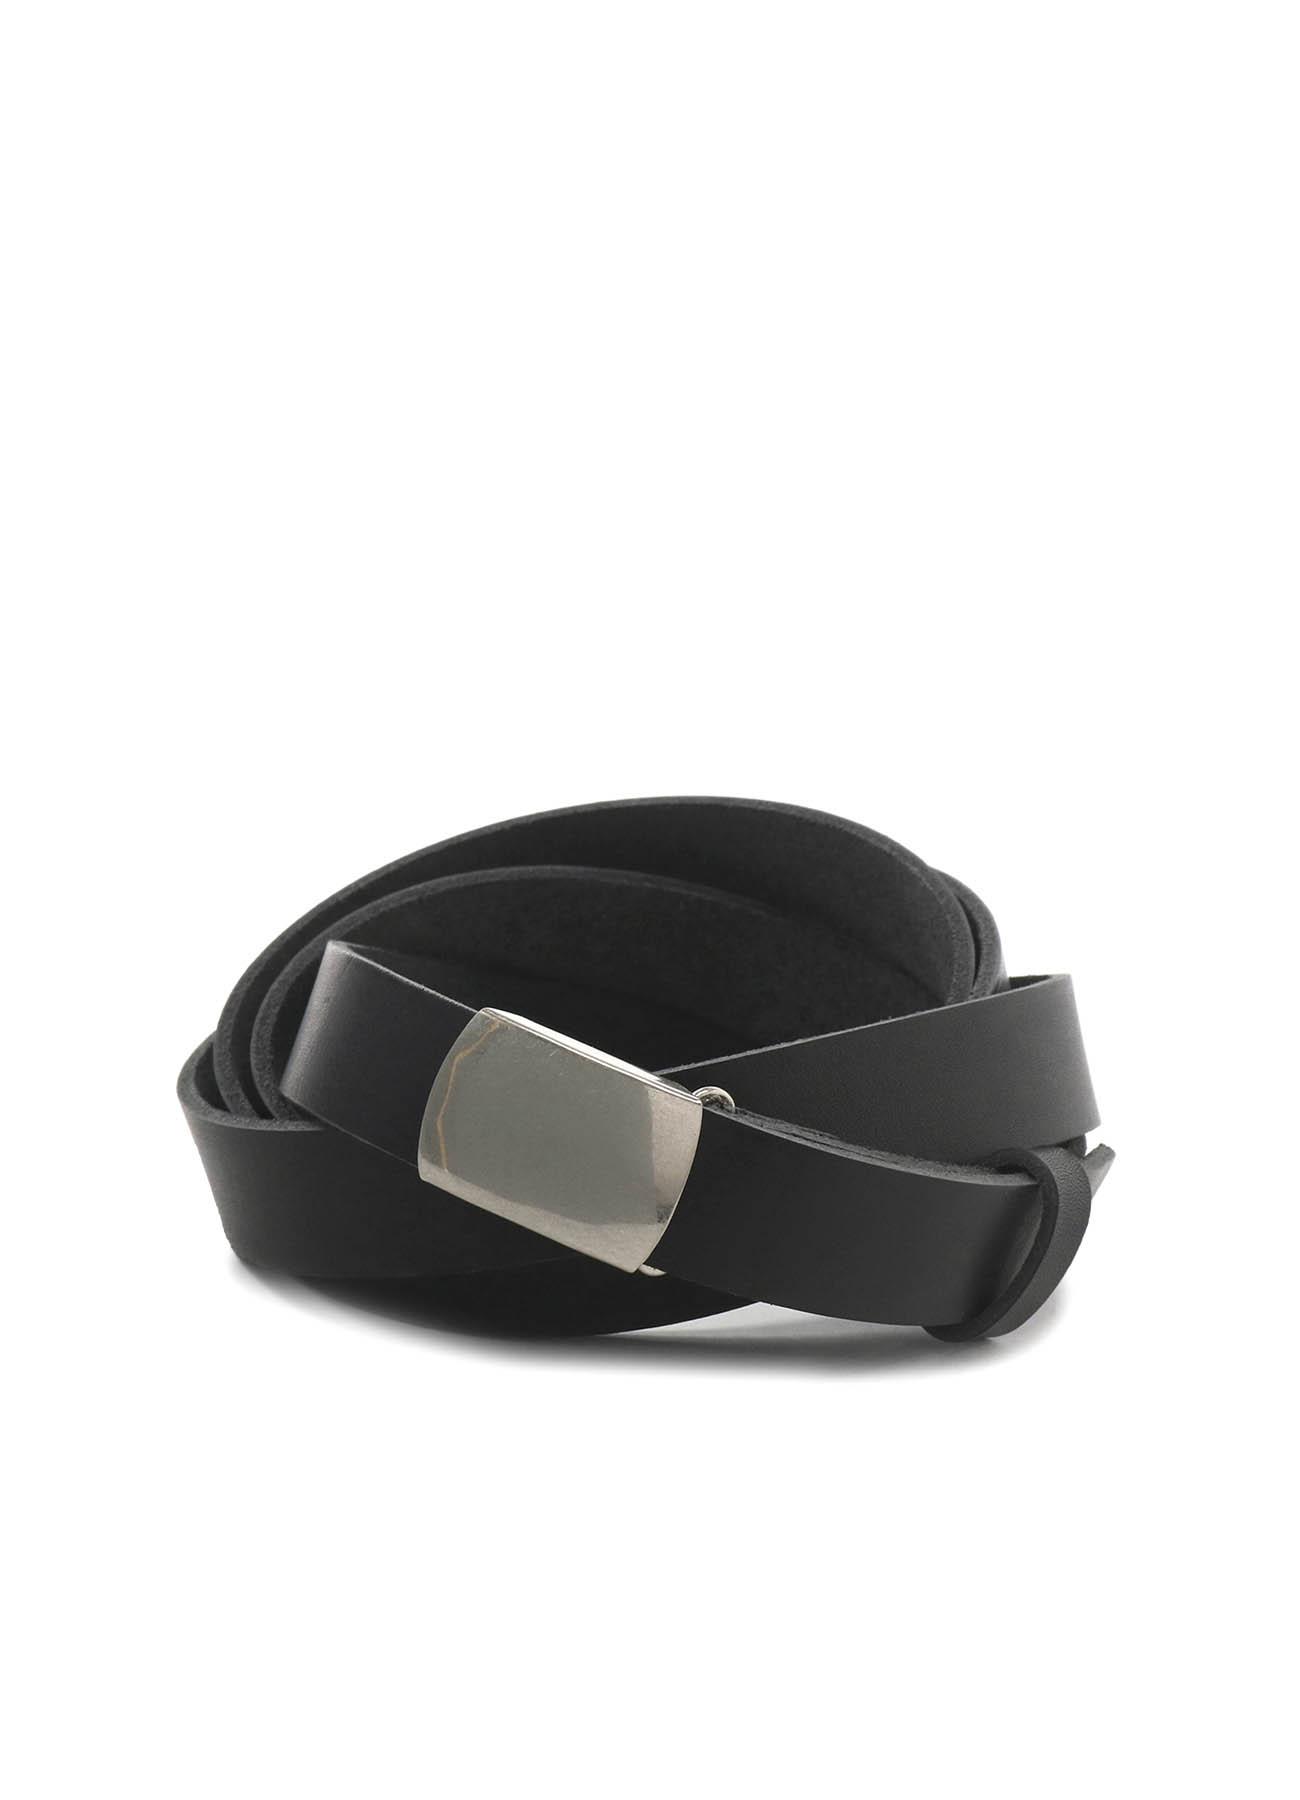 Soft Cow Leather Long Free Belt